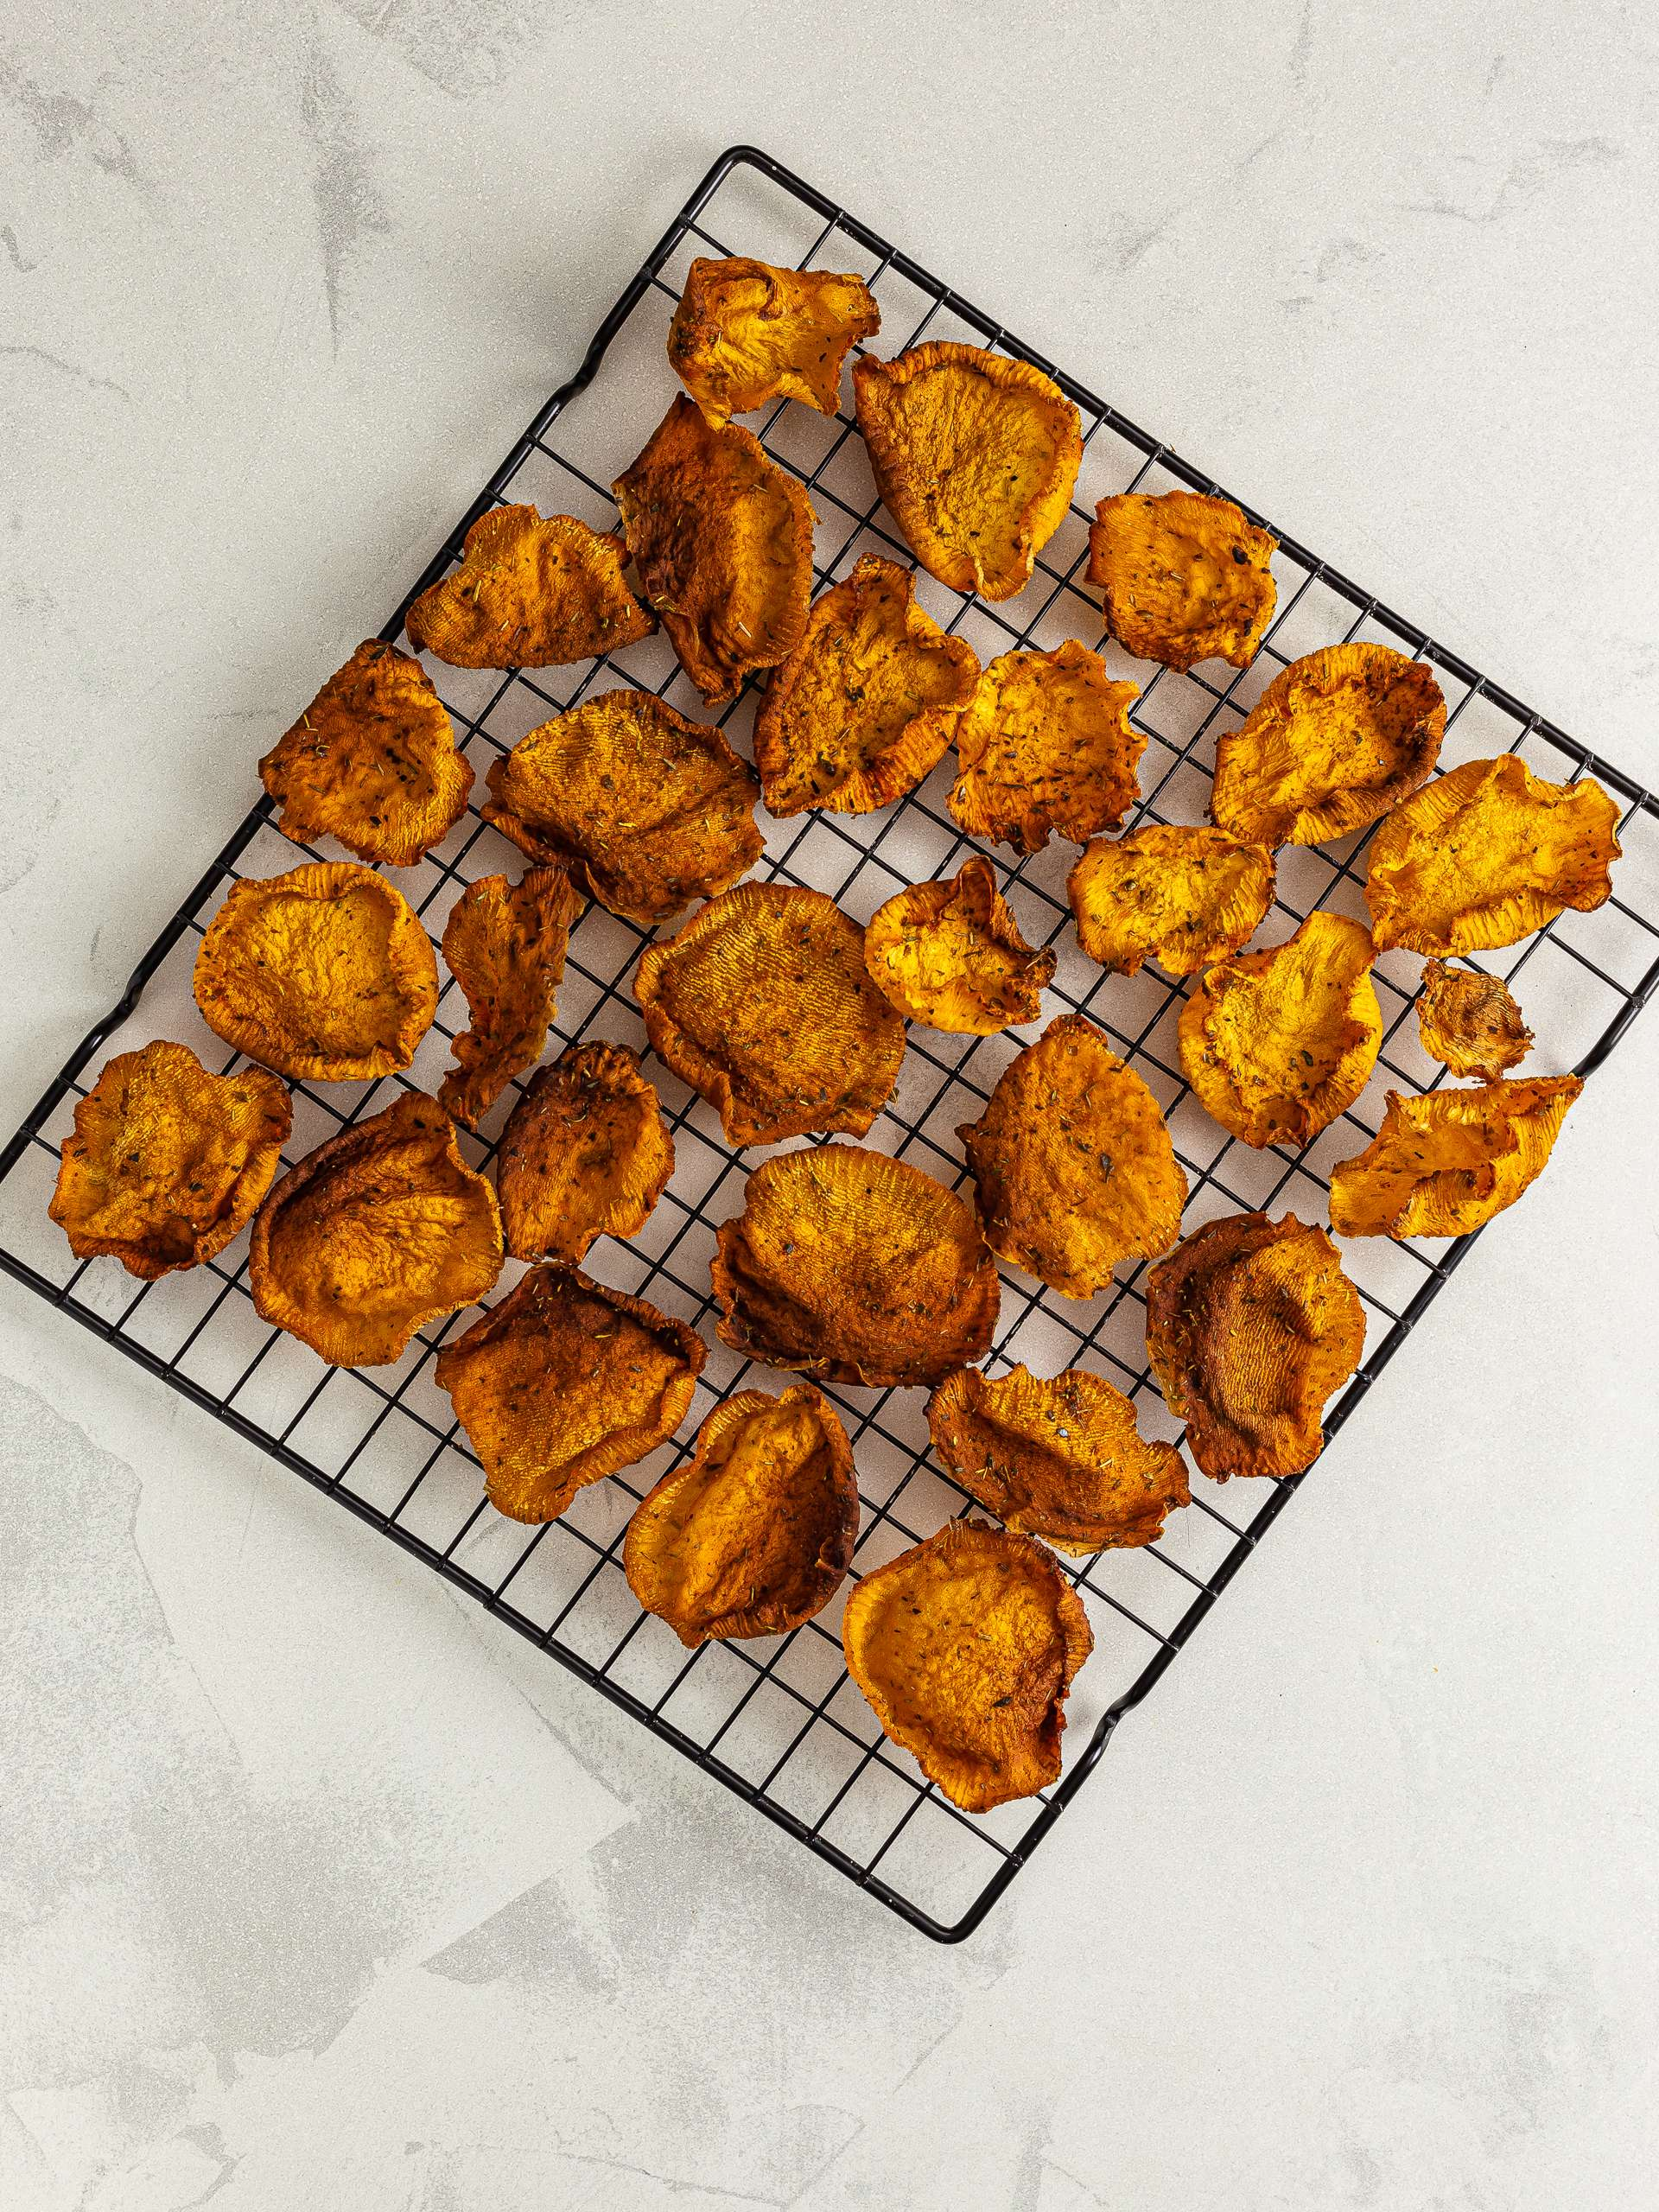 oven baked cajun rutabaga chips